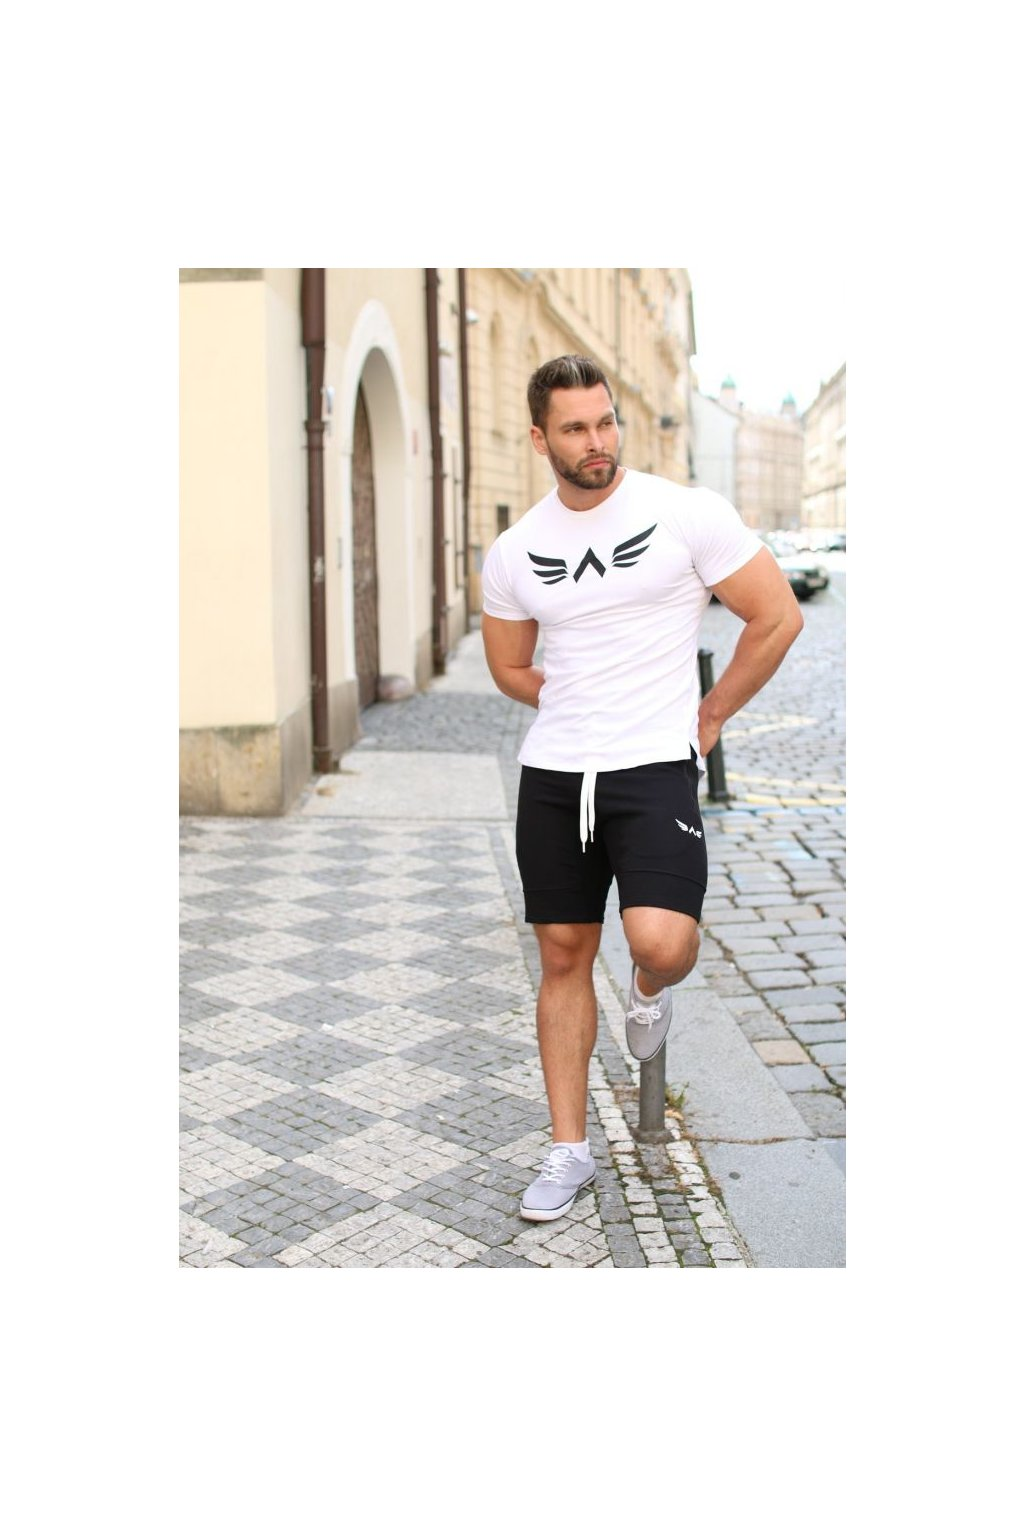 Pánské tričko Exalted X1 - Bílé